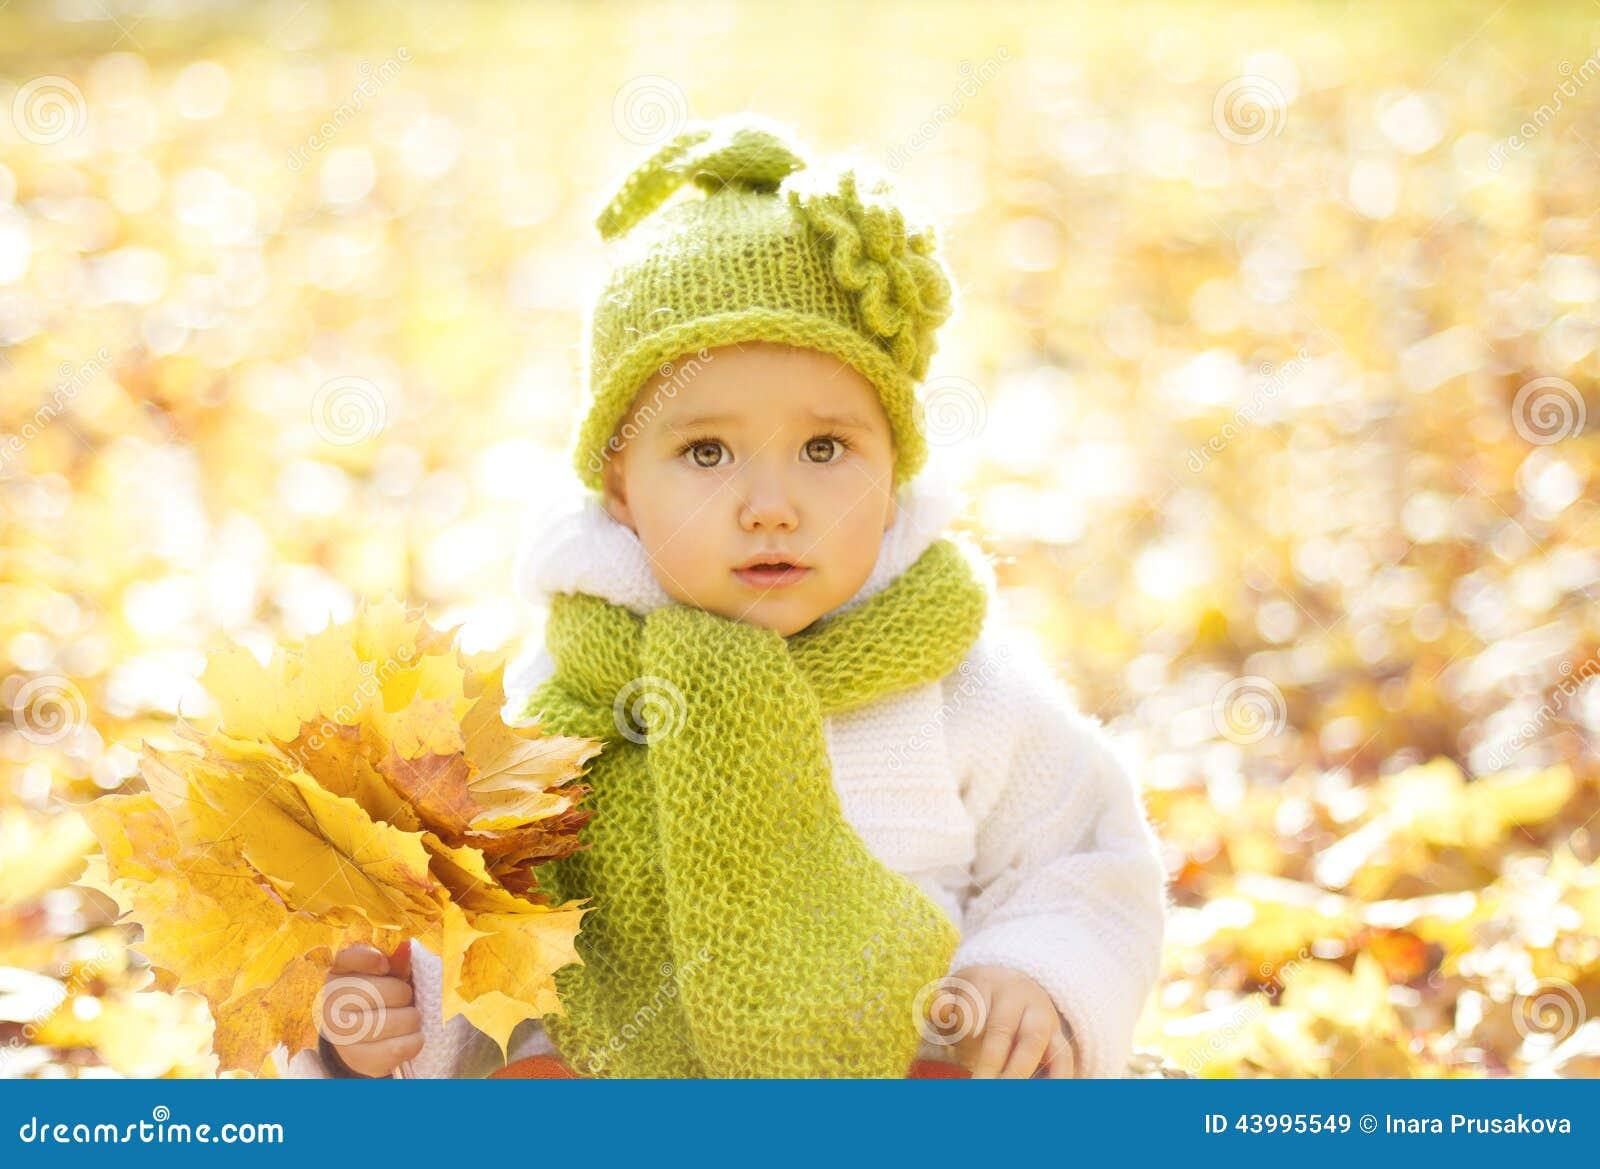 Feuilles de jaune d Autumn Baby Portrait In Fall, peu